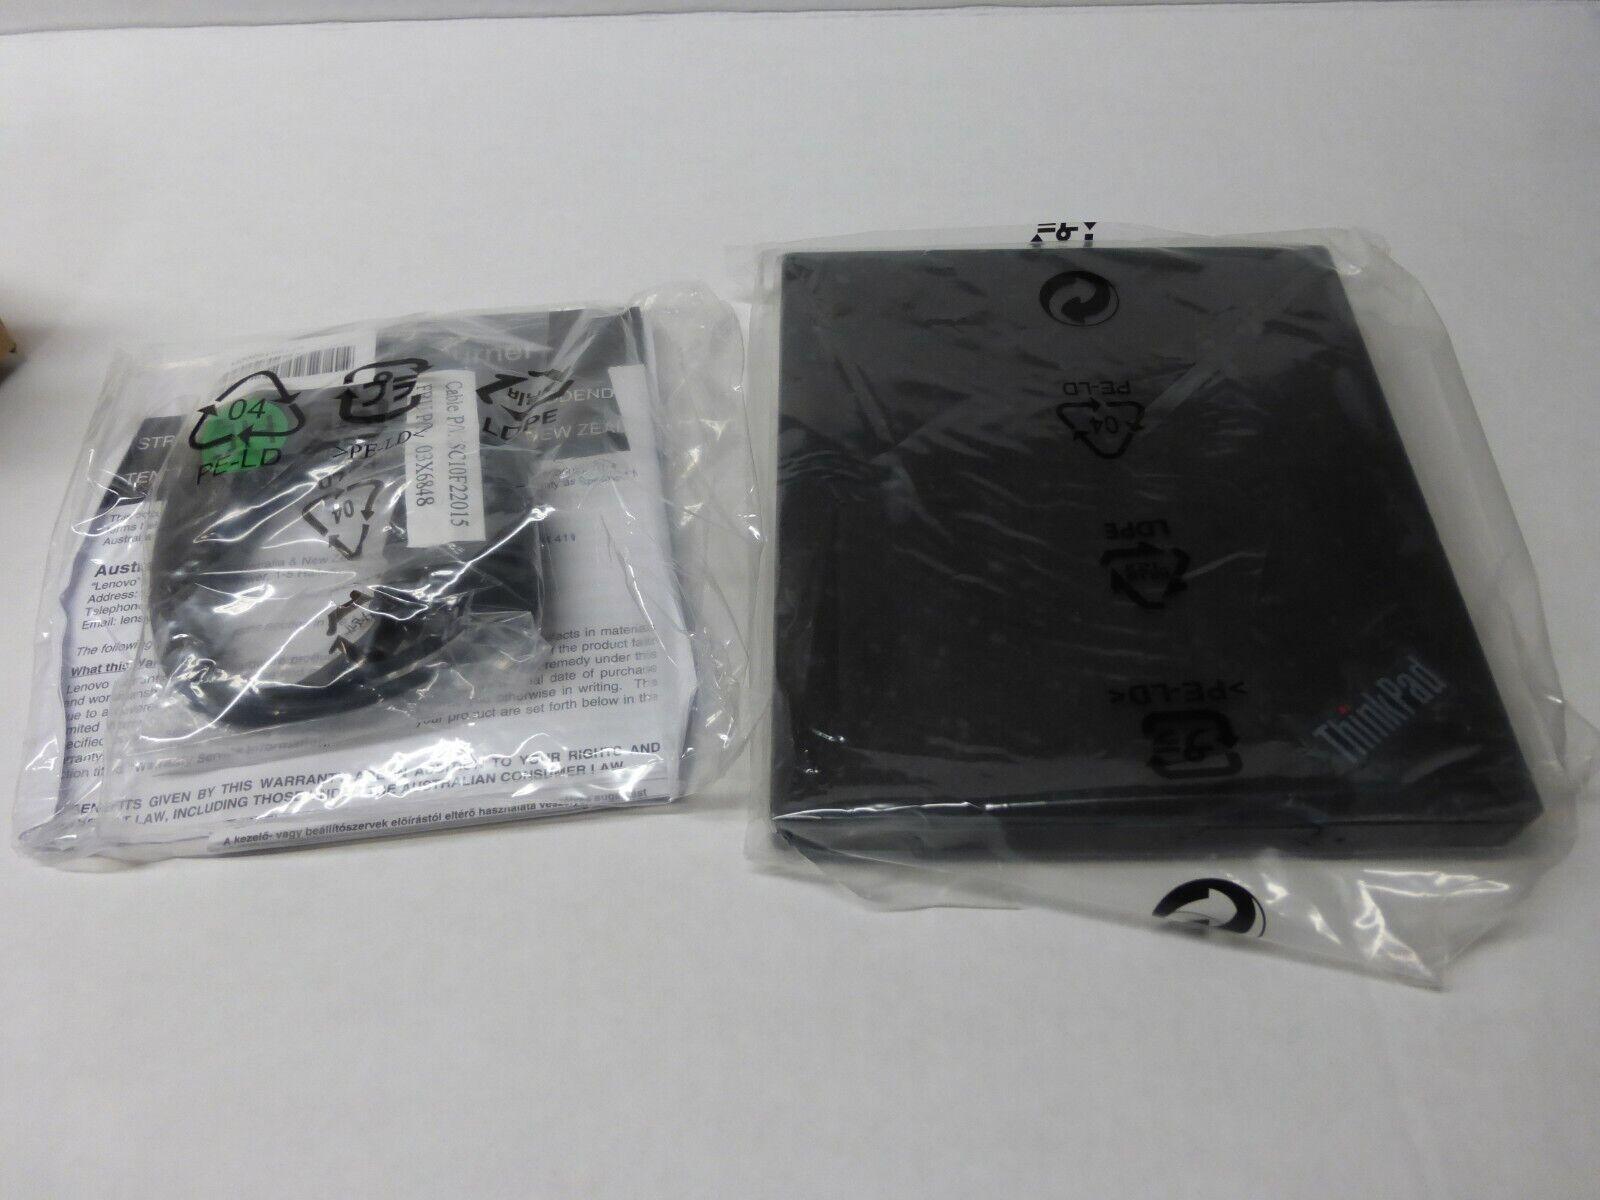 4XA0E97775 - ThinkPad UltraSlim USB DVD Burner Lenovo Brand